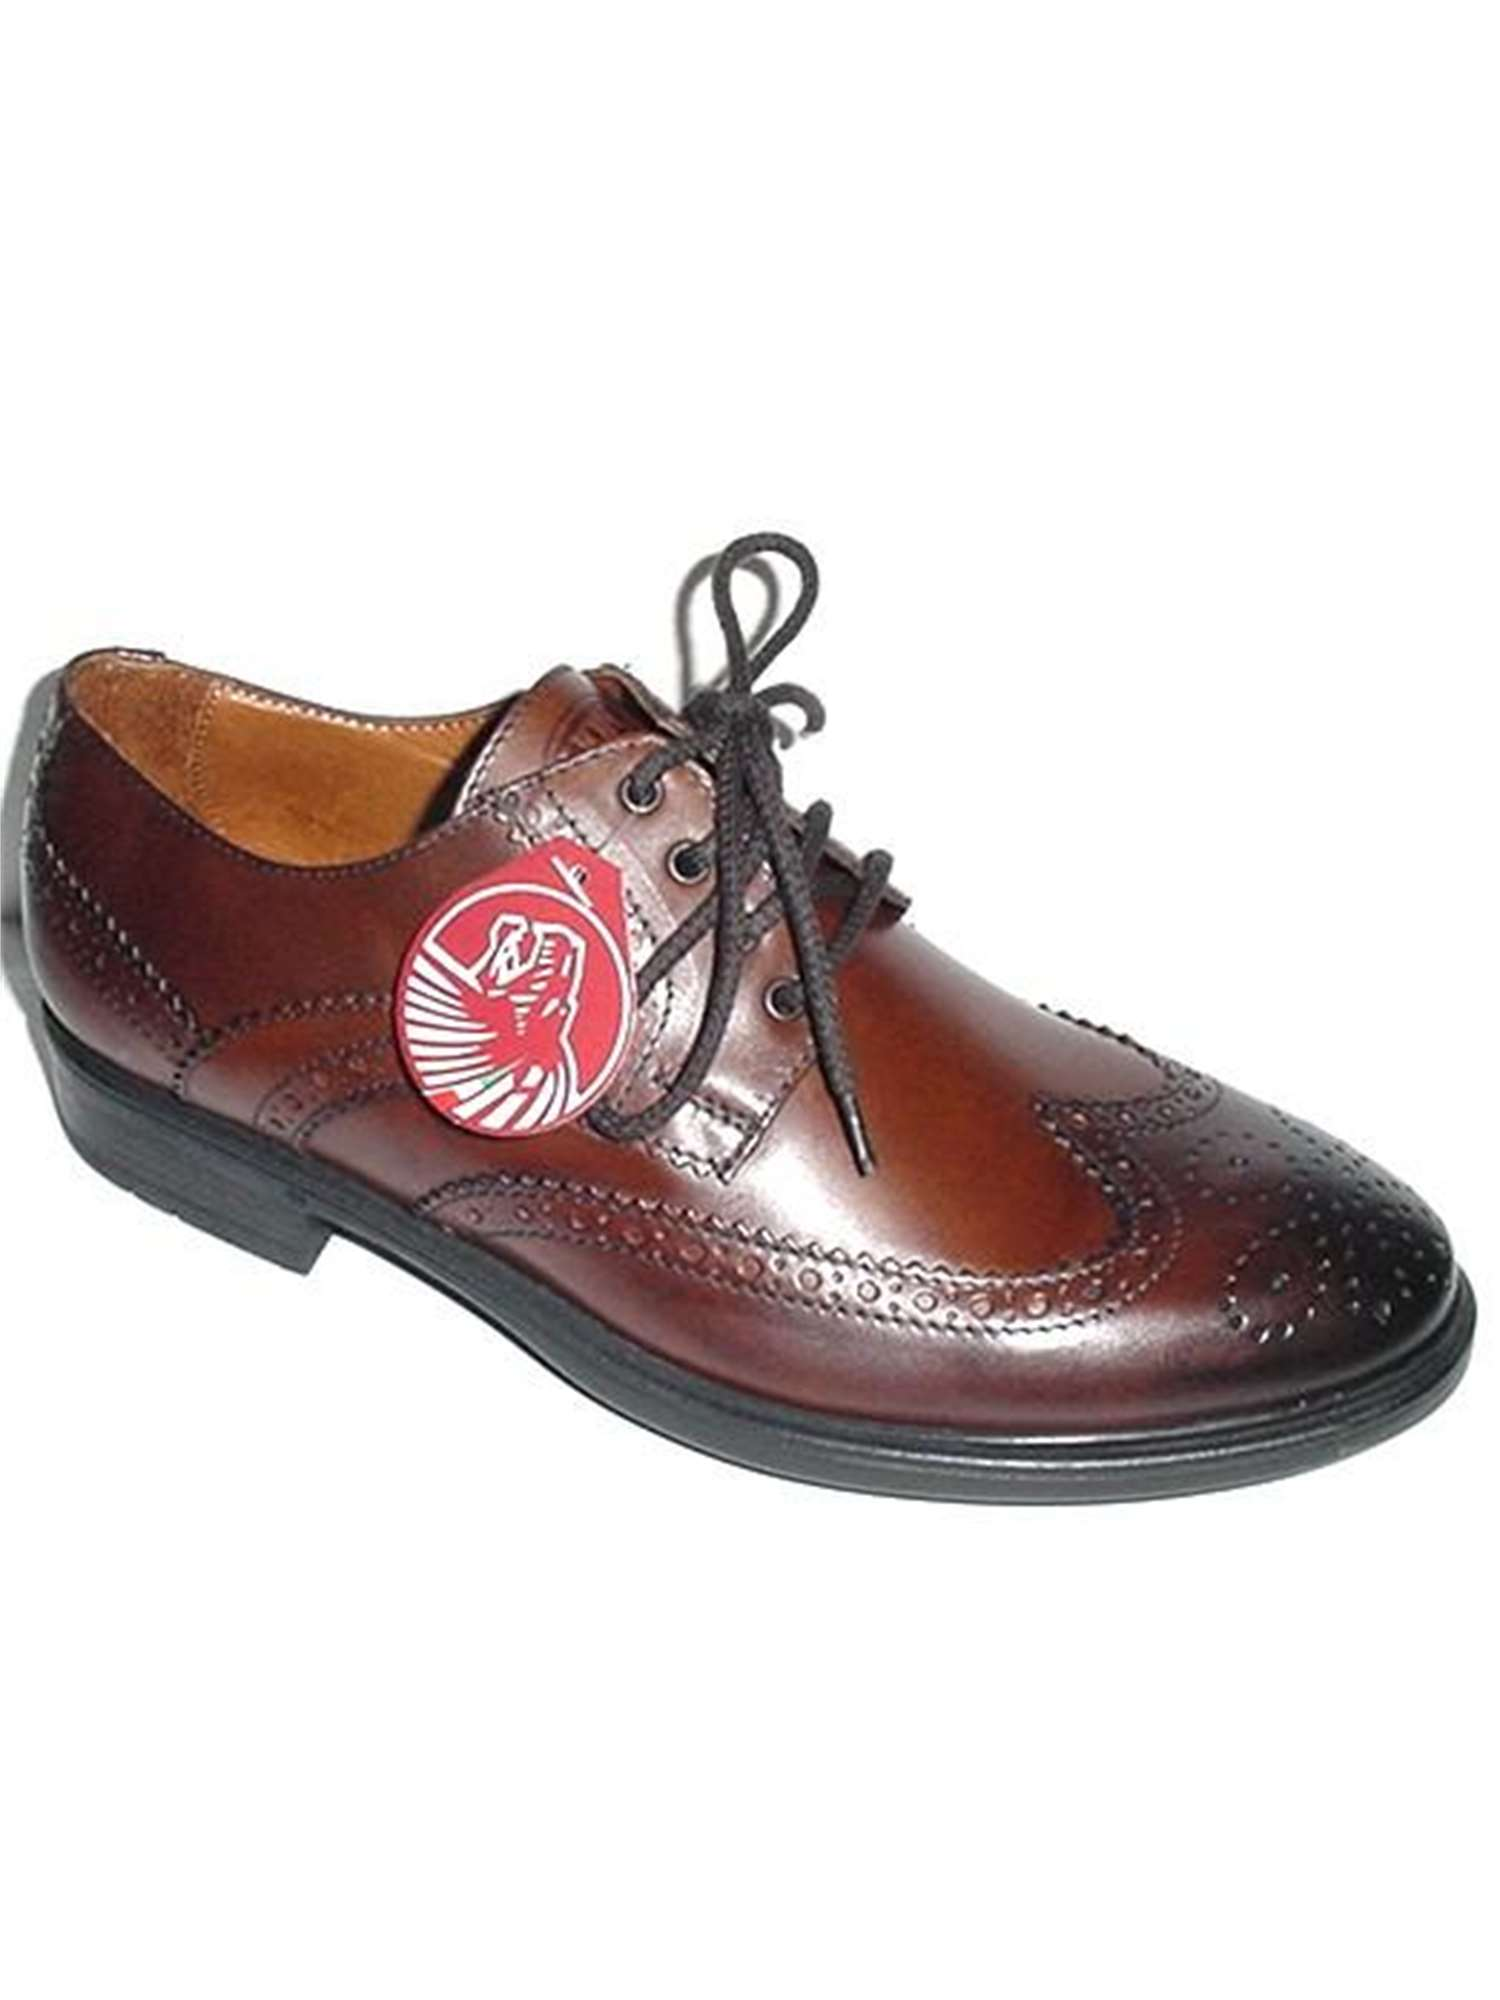 Lion Shoes Lacci Scarpa Tipo Inglese Marron  bf26a081df7